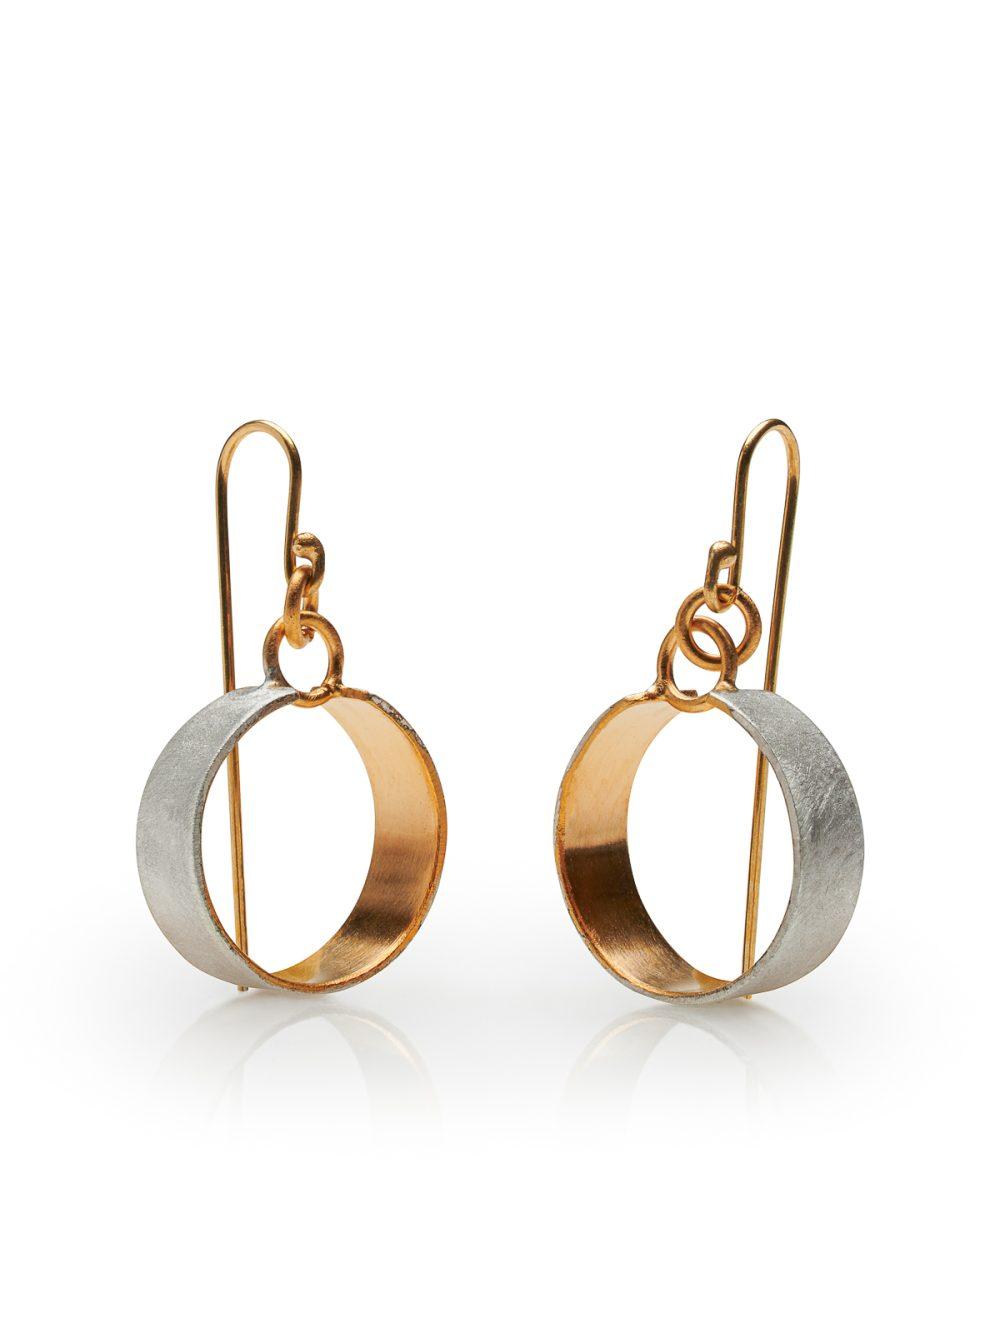 Jon Black - Silver Gold Circle Earrings